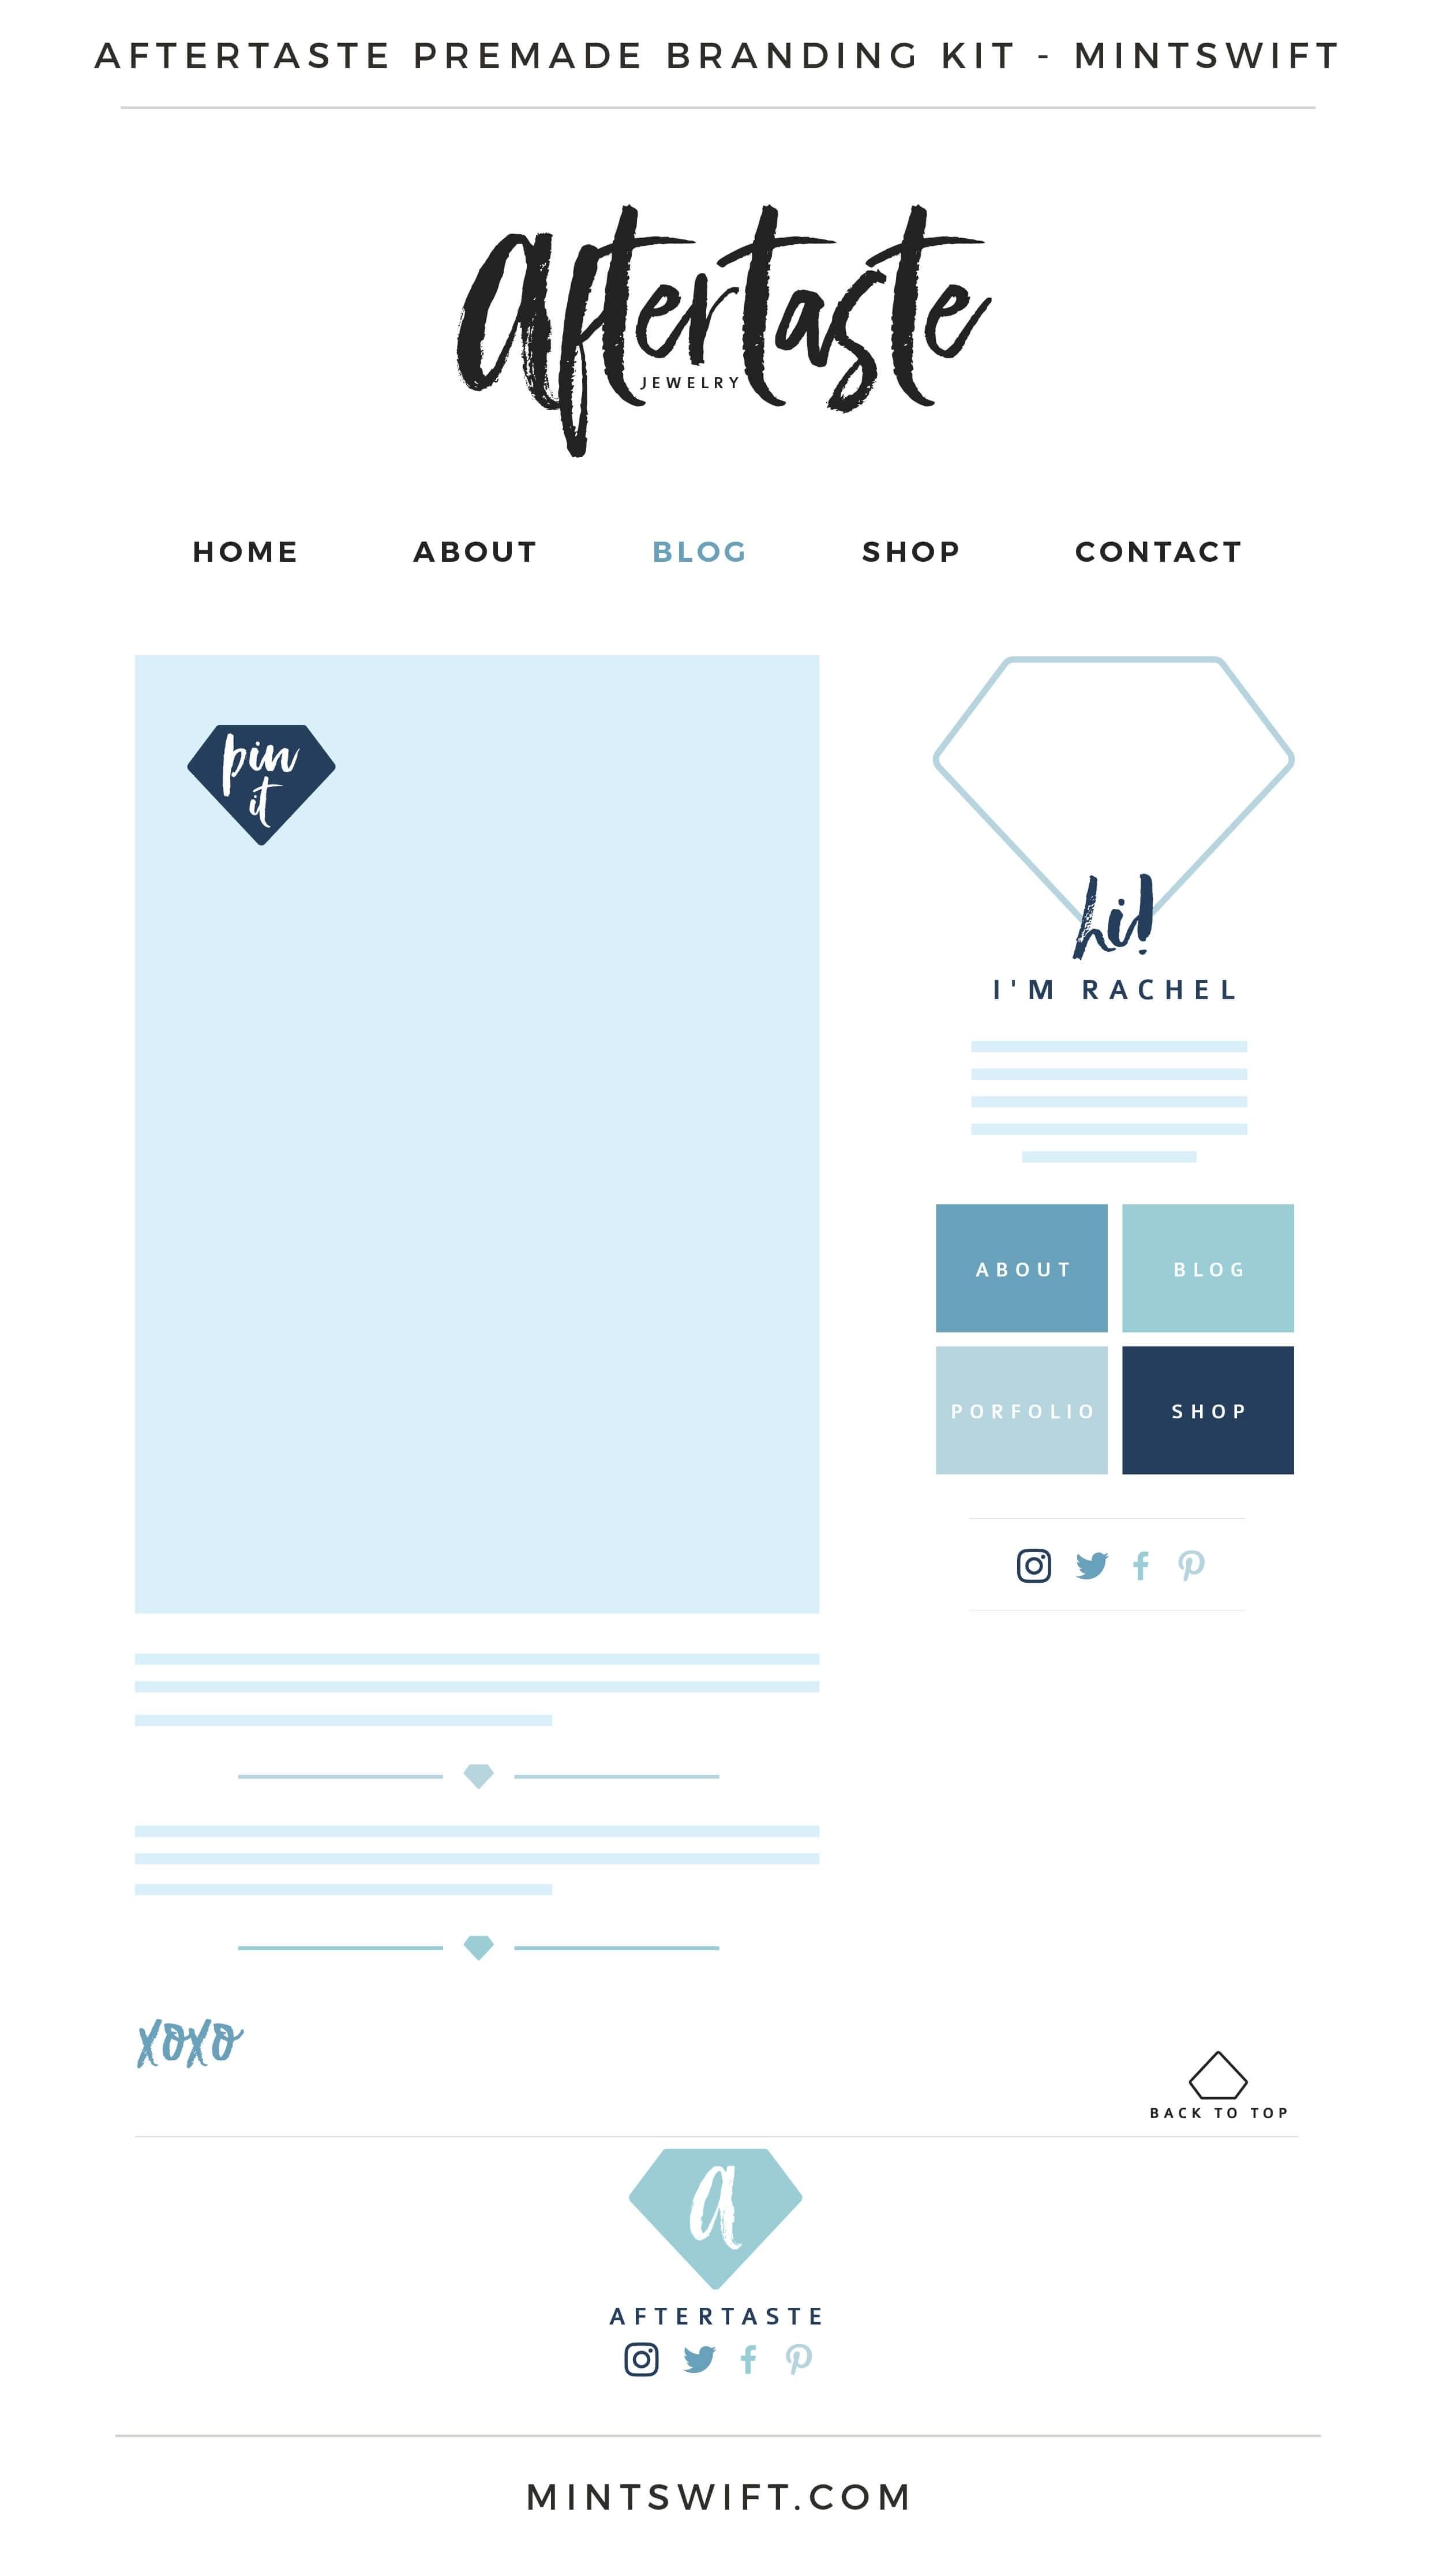 Aftertaste Premade Branding Kit | Branding Kit | Premade logo | Pre-made logo | Pre-made branding kit | Premade Brand Design| Branding | Brand Design | Website Design Kit | Blog Design Kit | Blog kit | Website kit | Website elements | Blog elements | Design elements | Branding kits shop | MintSwift Shop | Premade logo design | Add-On | Logo Design | MintSwift| Adrianna Glowacka | MintSwift Design